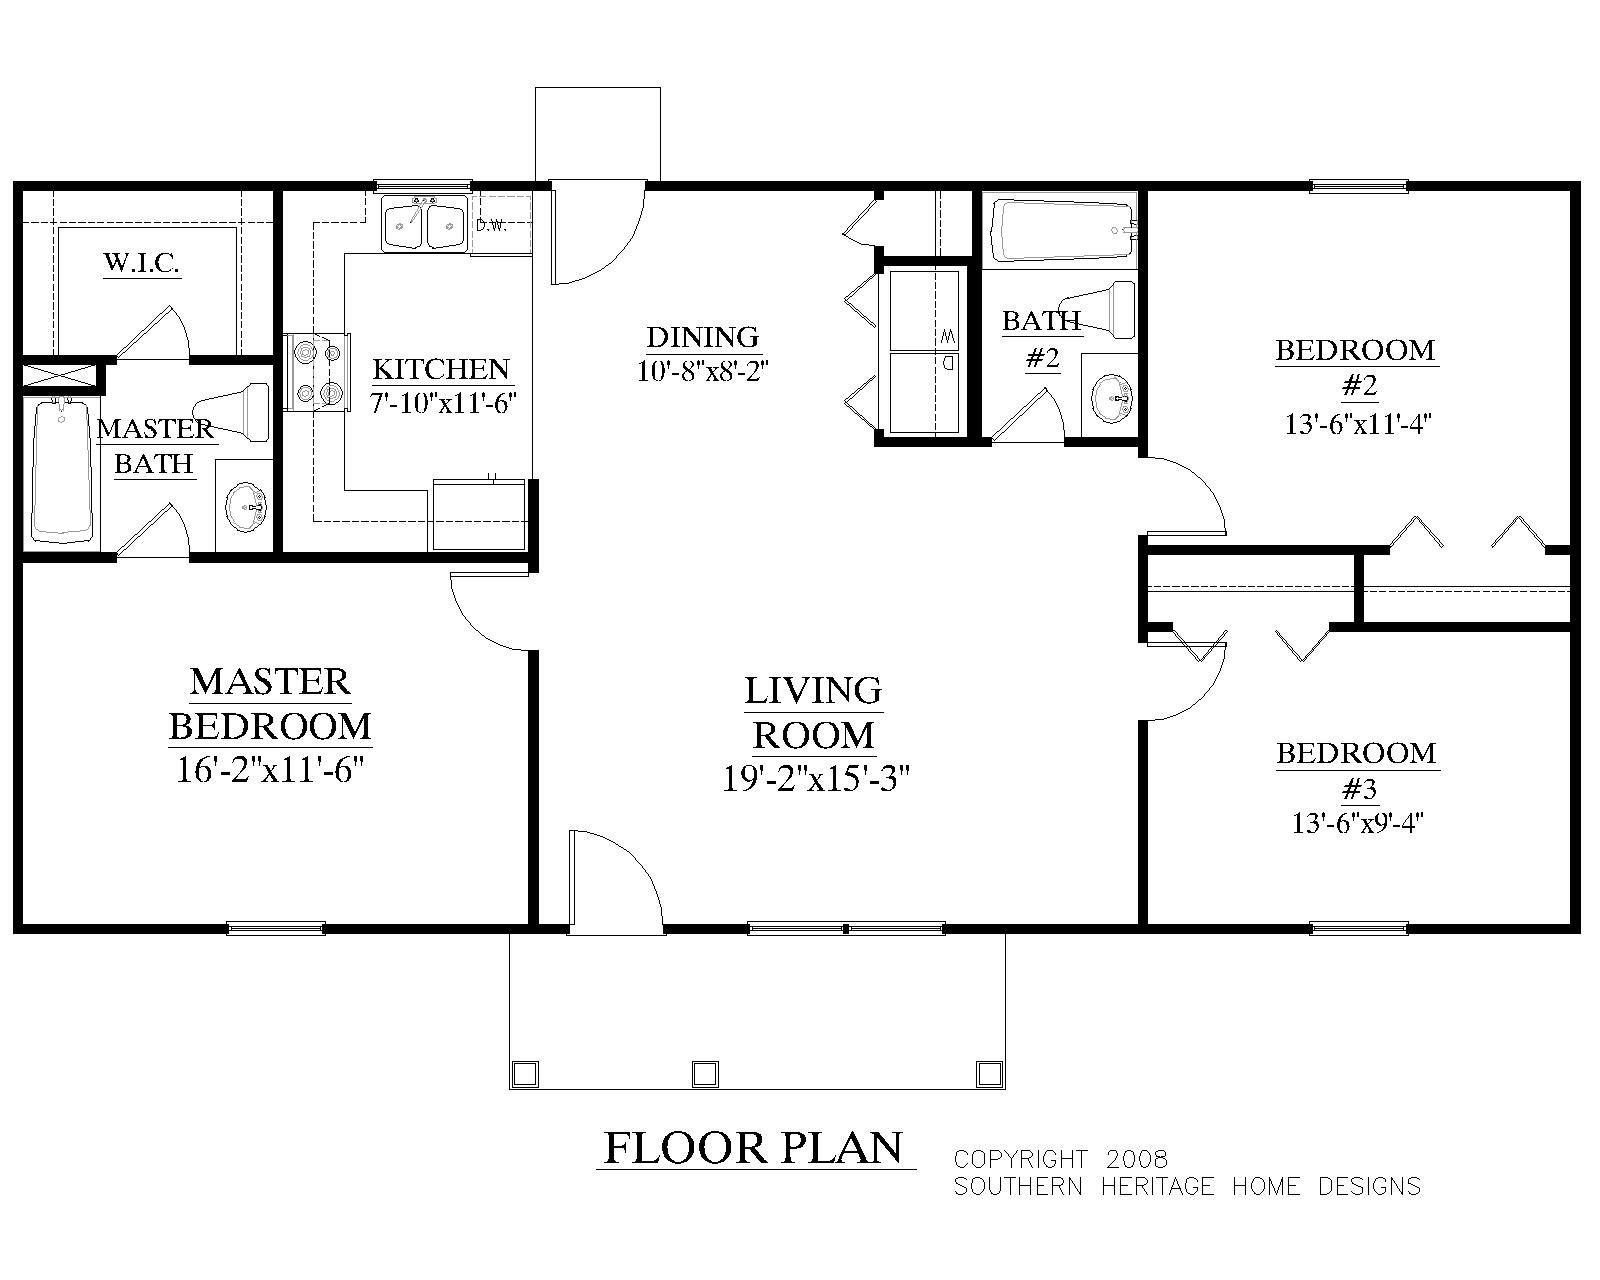 House Plan 1200 A The Korey A Floor Plan 20x40 House Plans